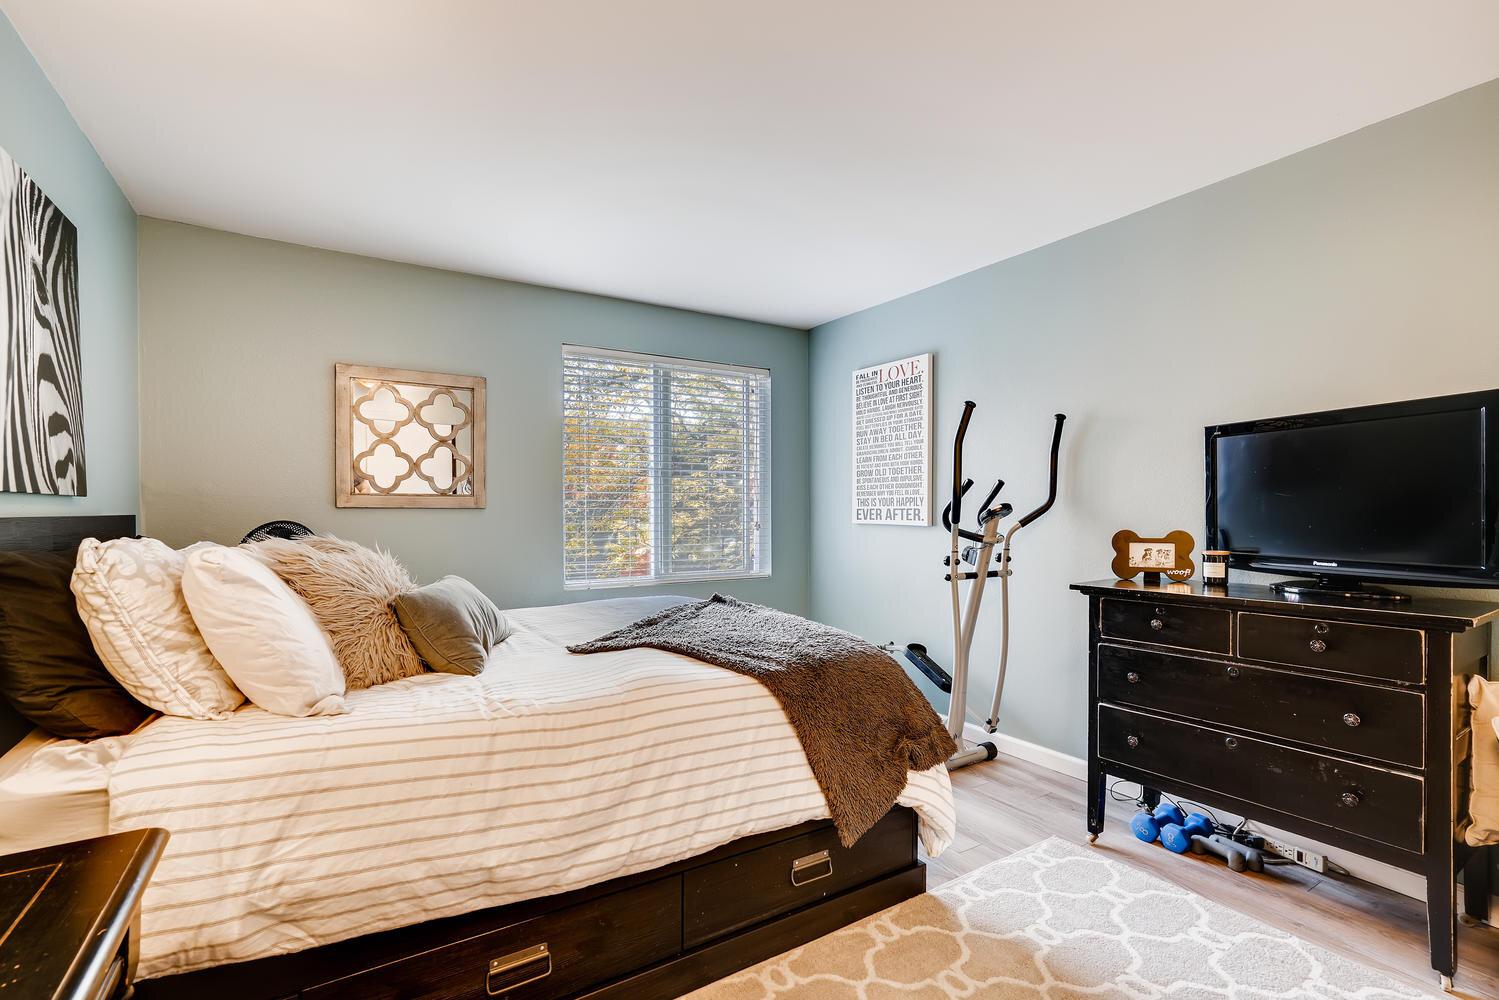 7021 Sand Point Way  B210-large-017-023-Master Bedroom-1499x1000-72dpi.jpg